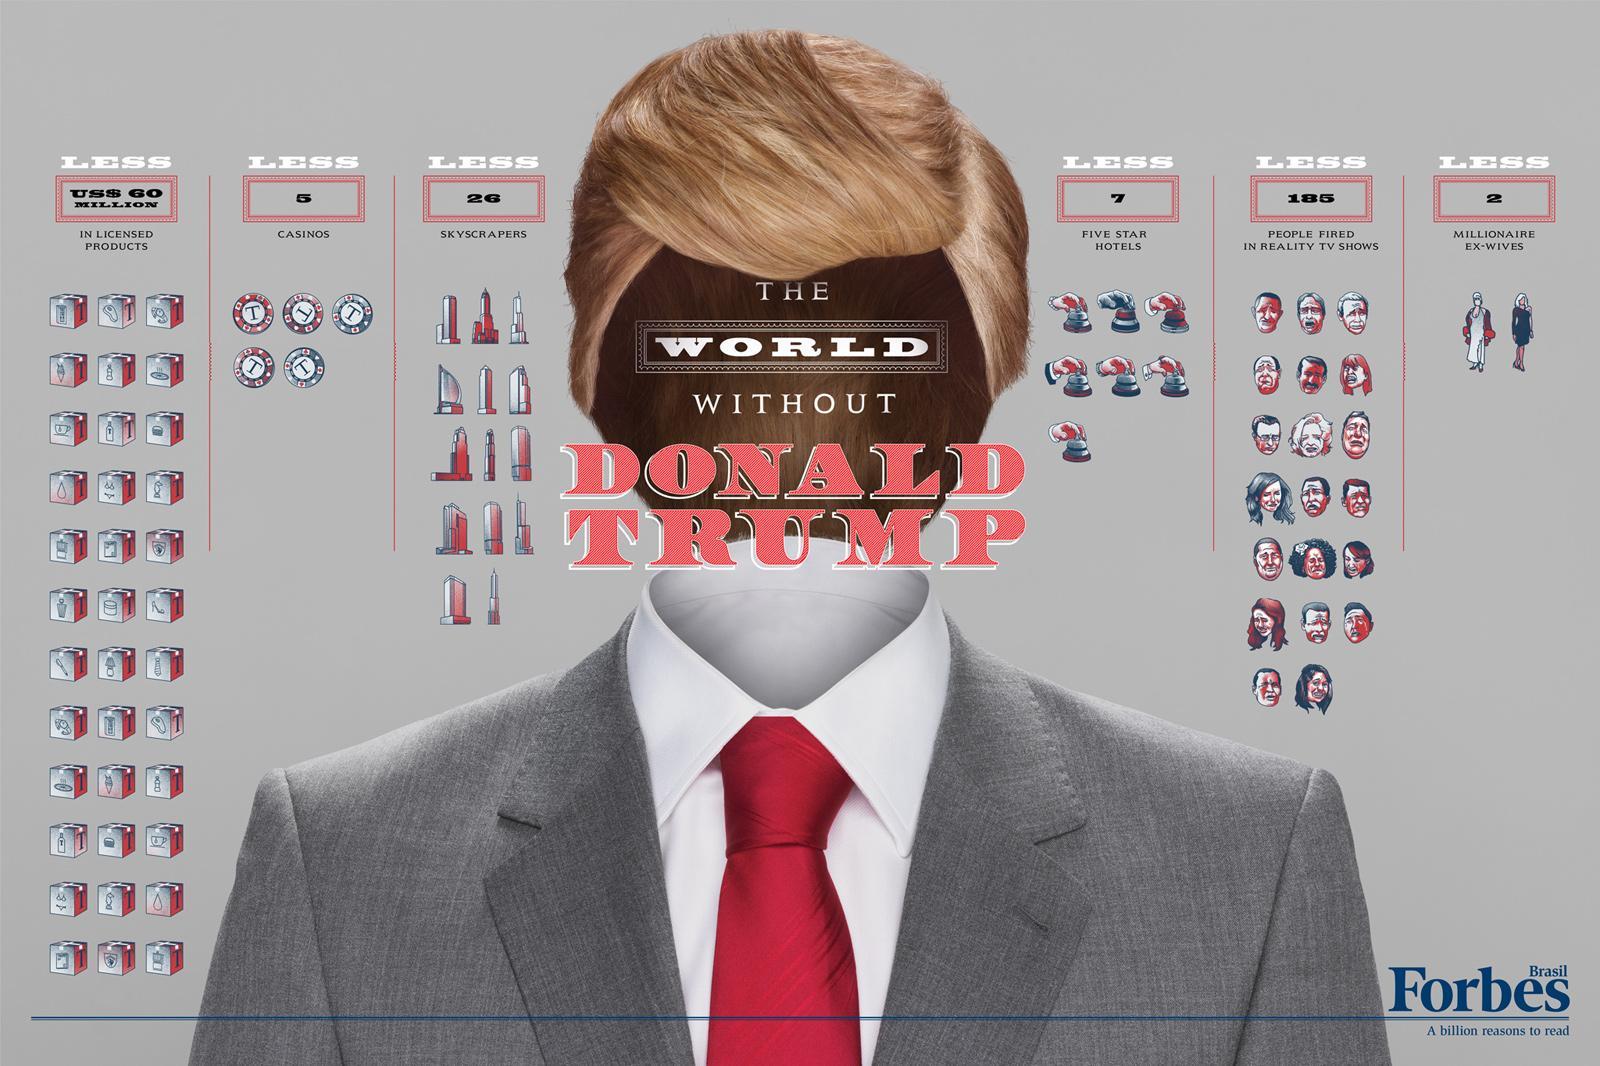 Forbes Print Ad -  Billionaires, Donald Trump